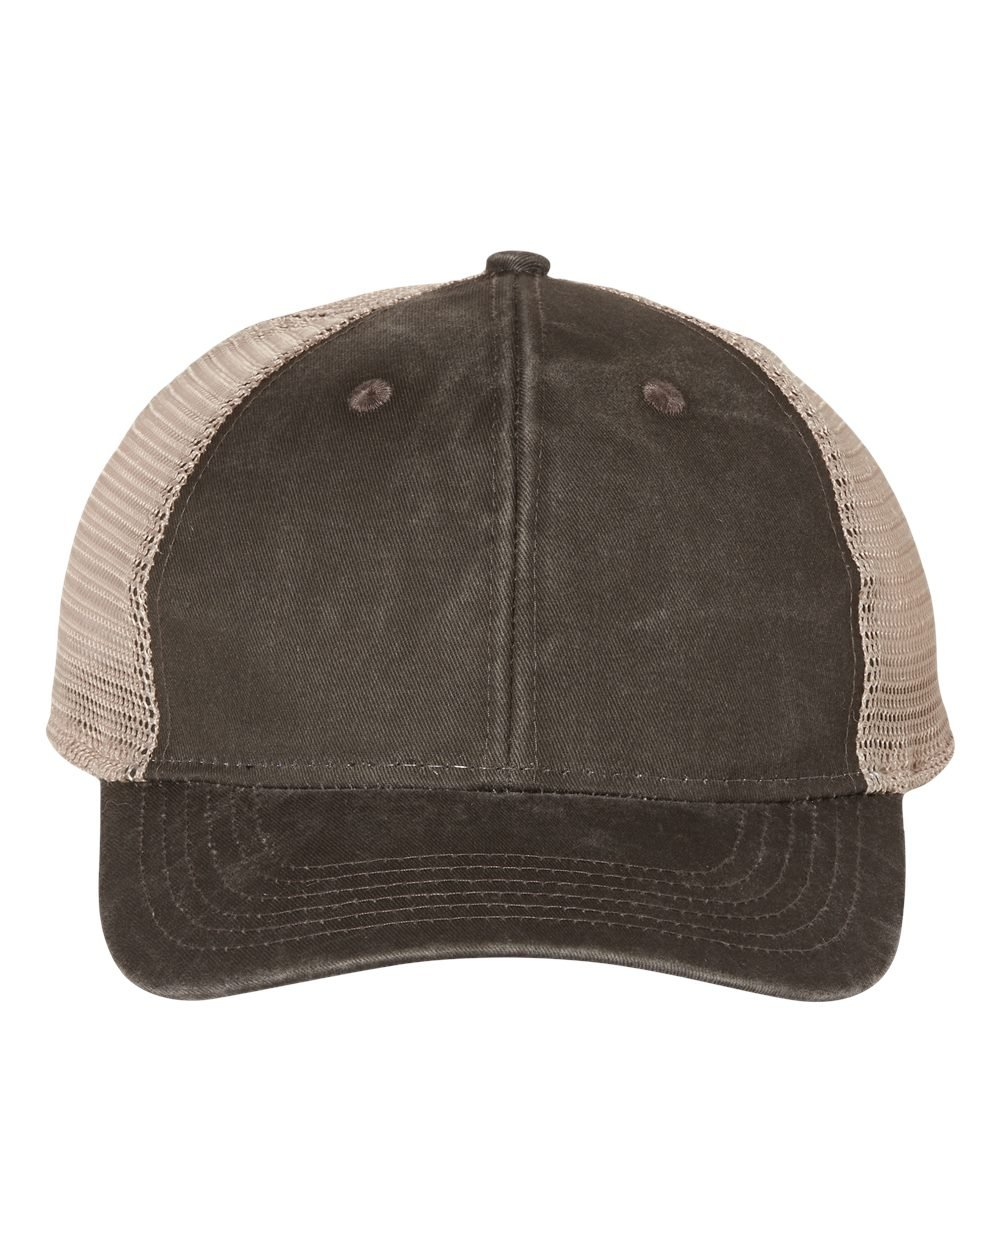 PNY100M - Outdoor Cap - Ponytail Mesh-Back Cap